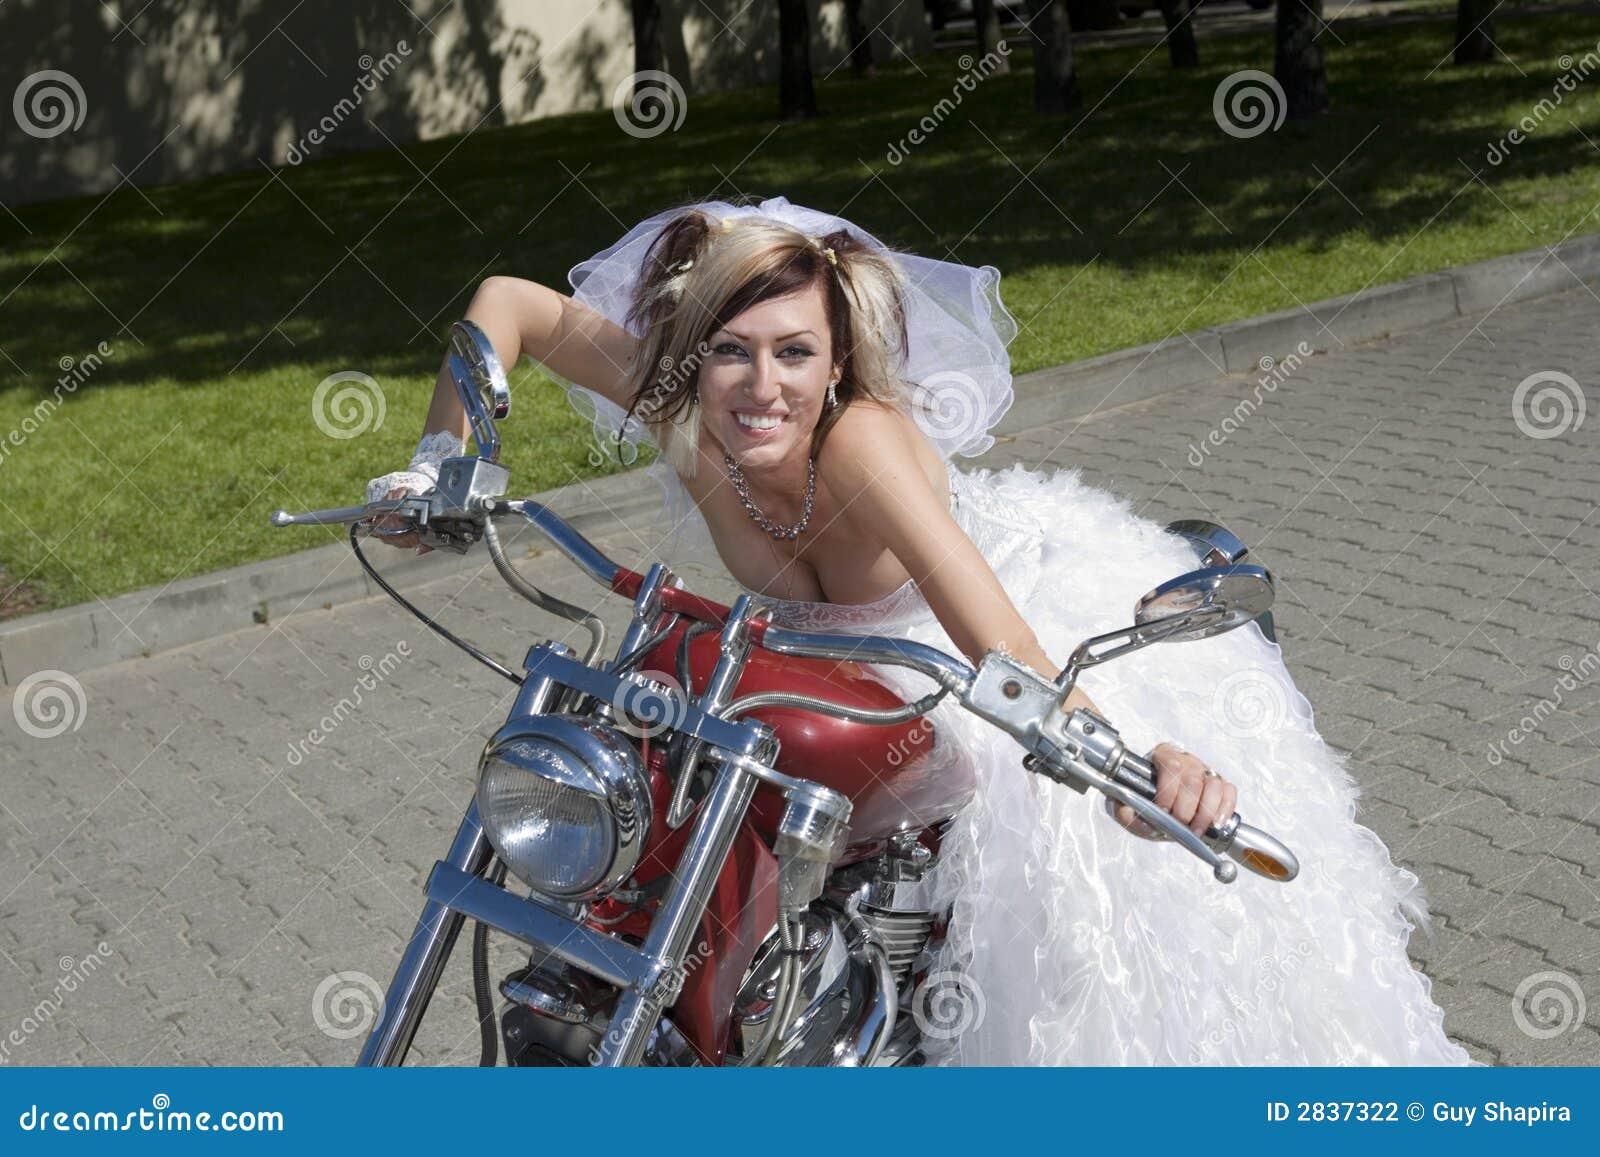 Bride on motorcycle